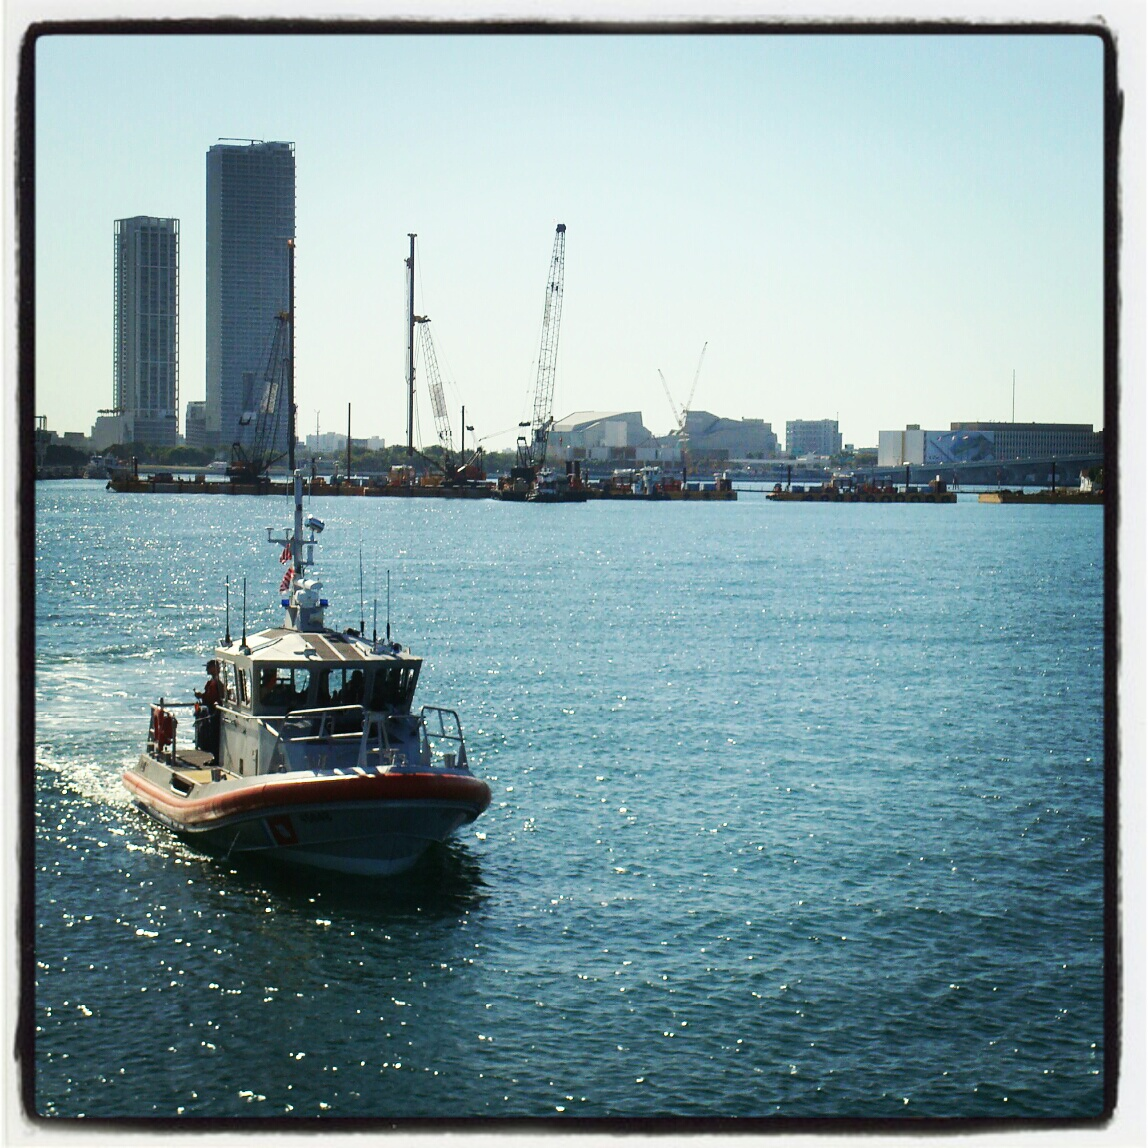 45' Response Boat-Medium